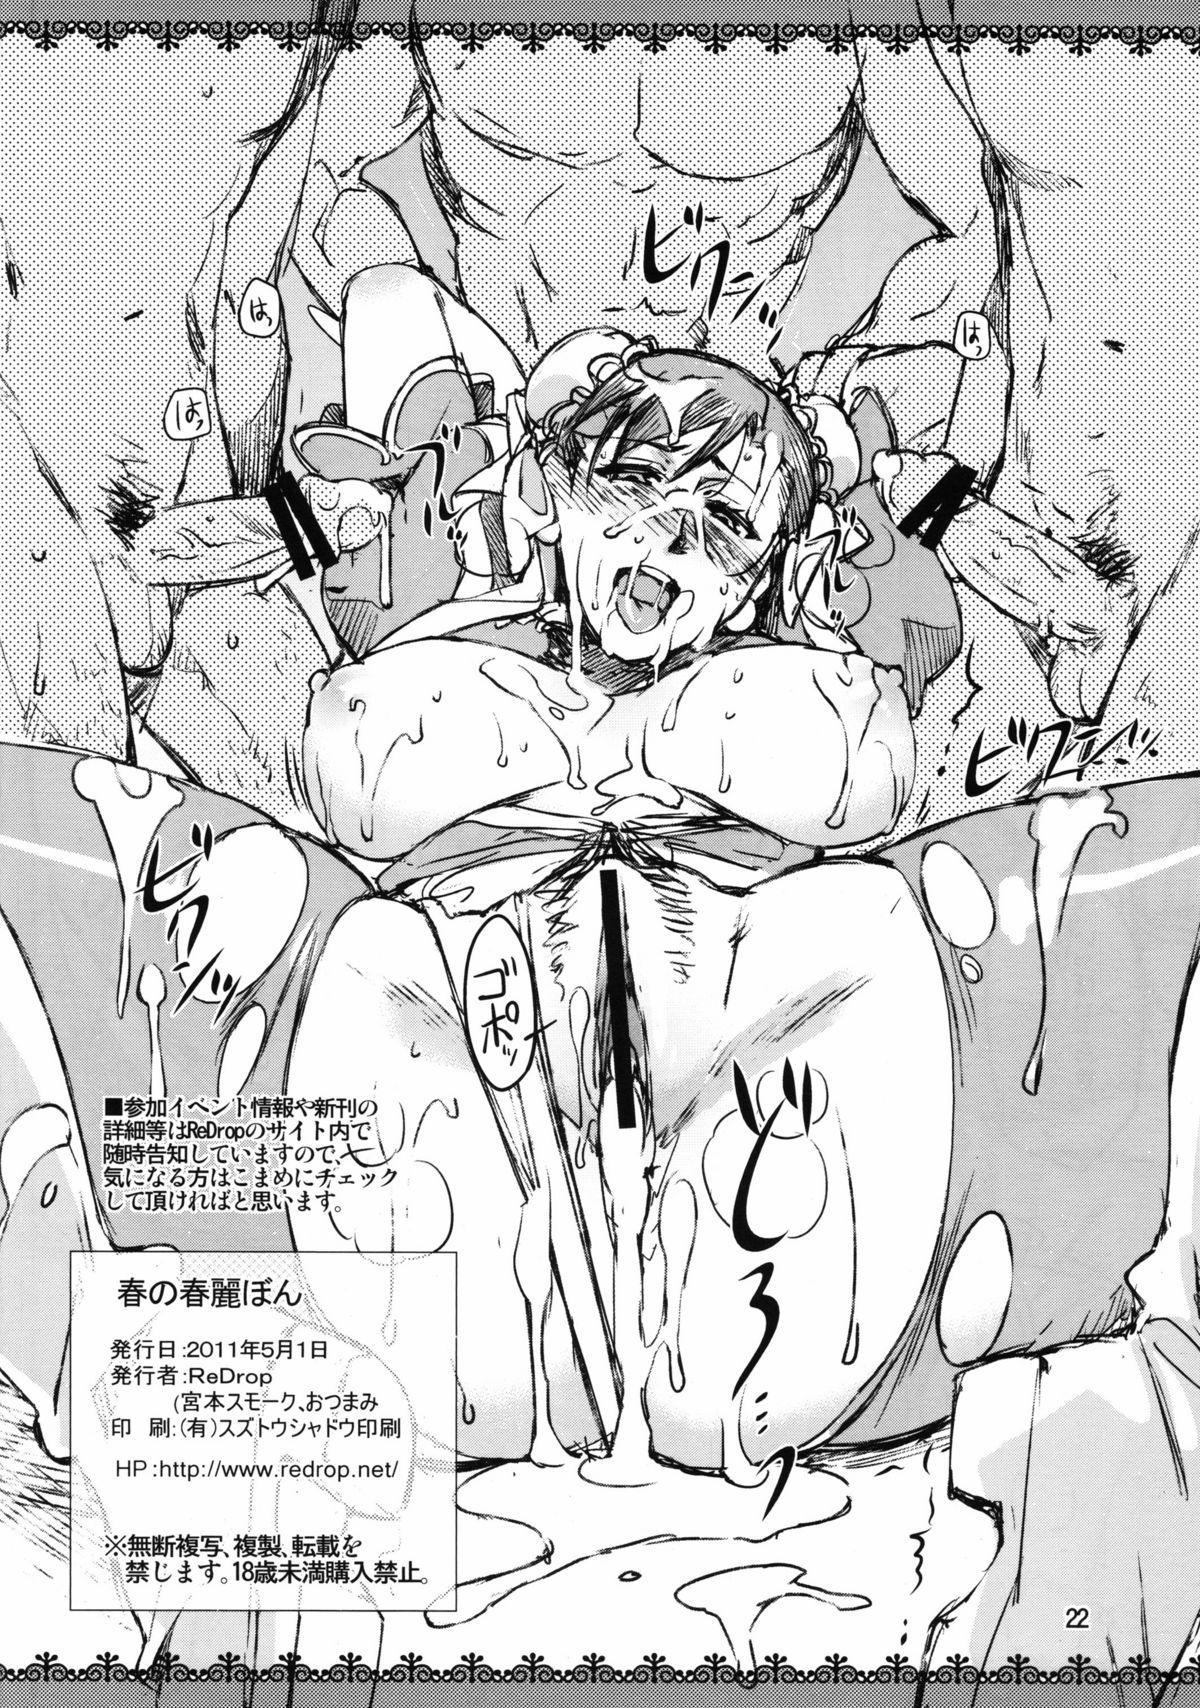 (COMIC1☆5) [ReDrop (Miyamoto Smoke, Otsumami)] Haru no Chun-Li Bon   The Chun-Li Spring Book (Street Fighter) [English] {doujin-moe.us} 21